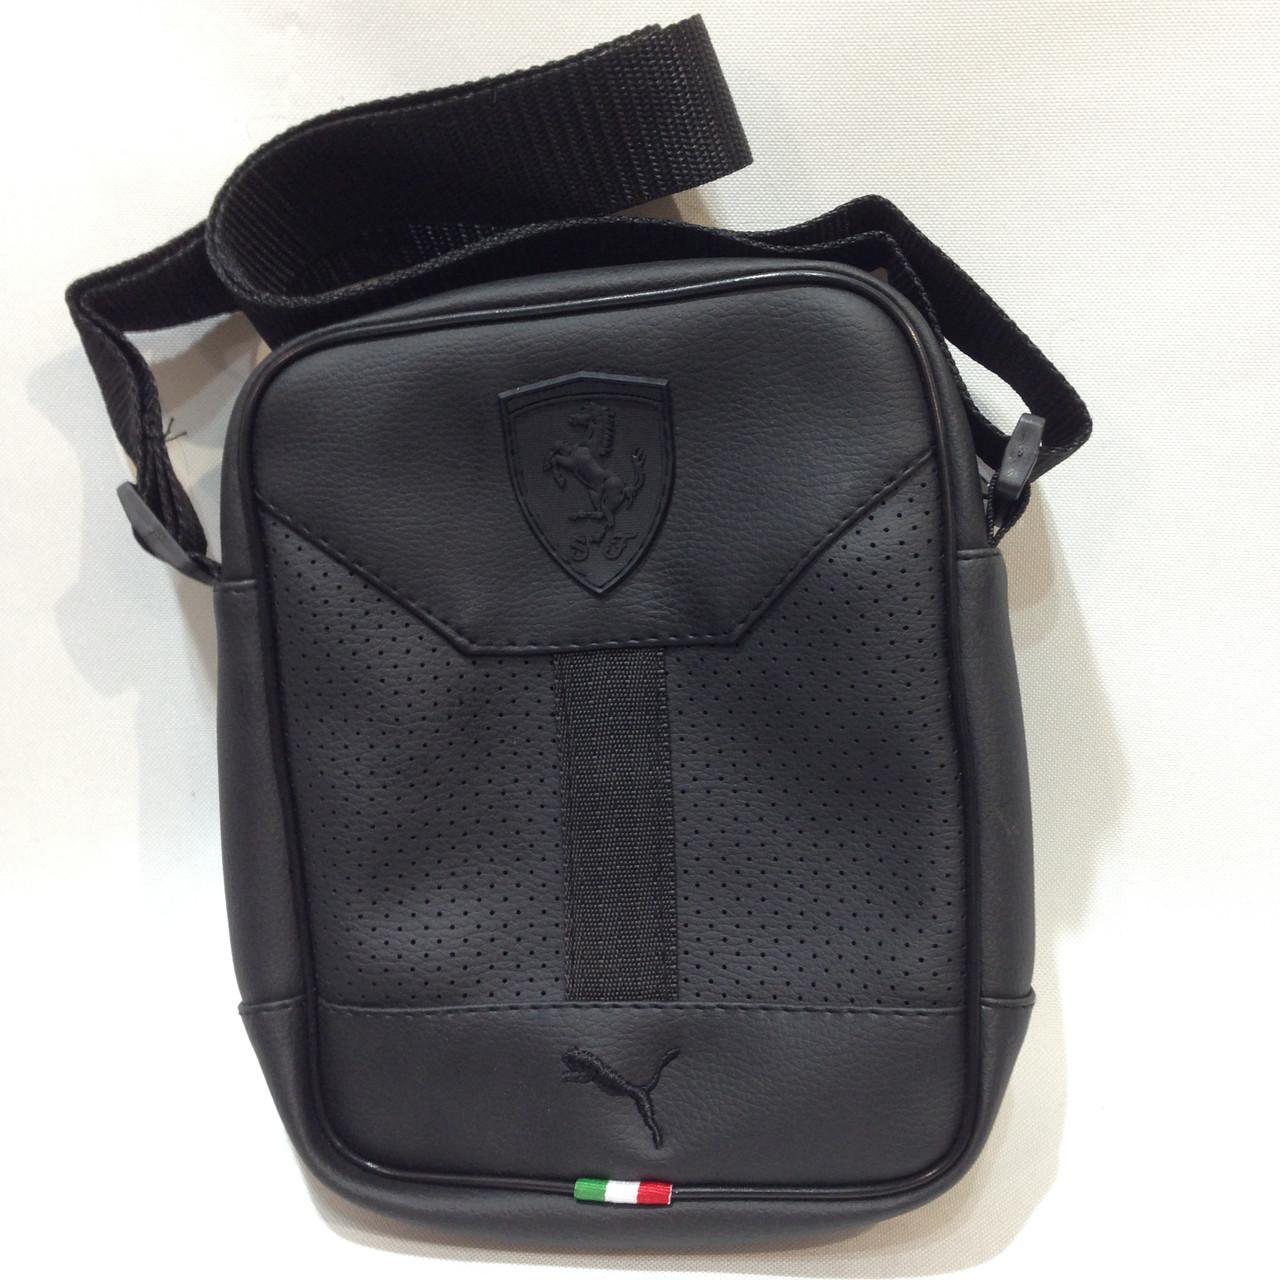 Мужская барсетка в стиле Puma, сумка через плечо